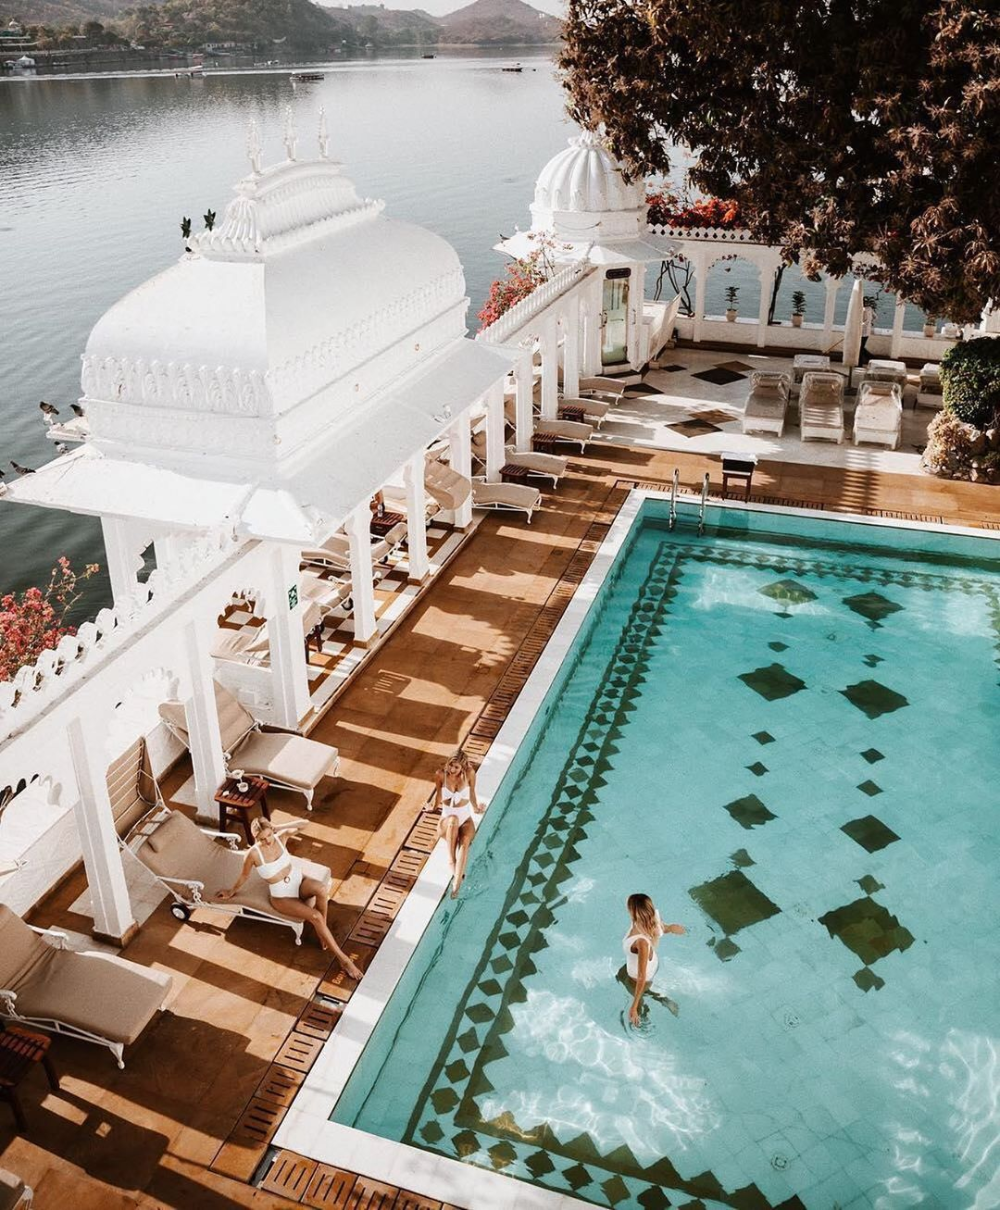 Taj Lake Palace Hotel, India in 2020 Udaipur, Beautiful